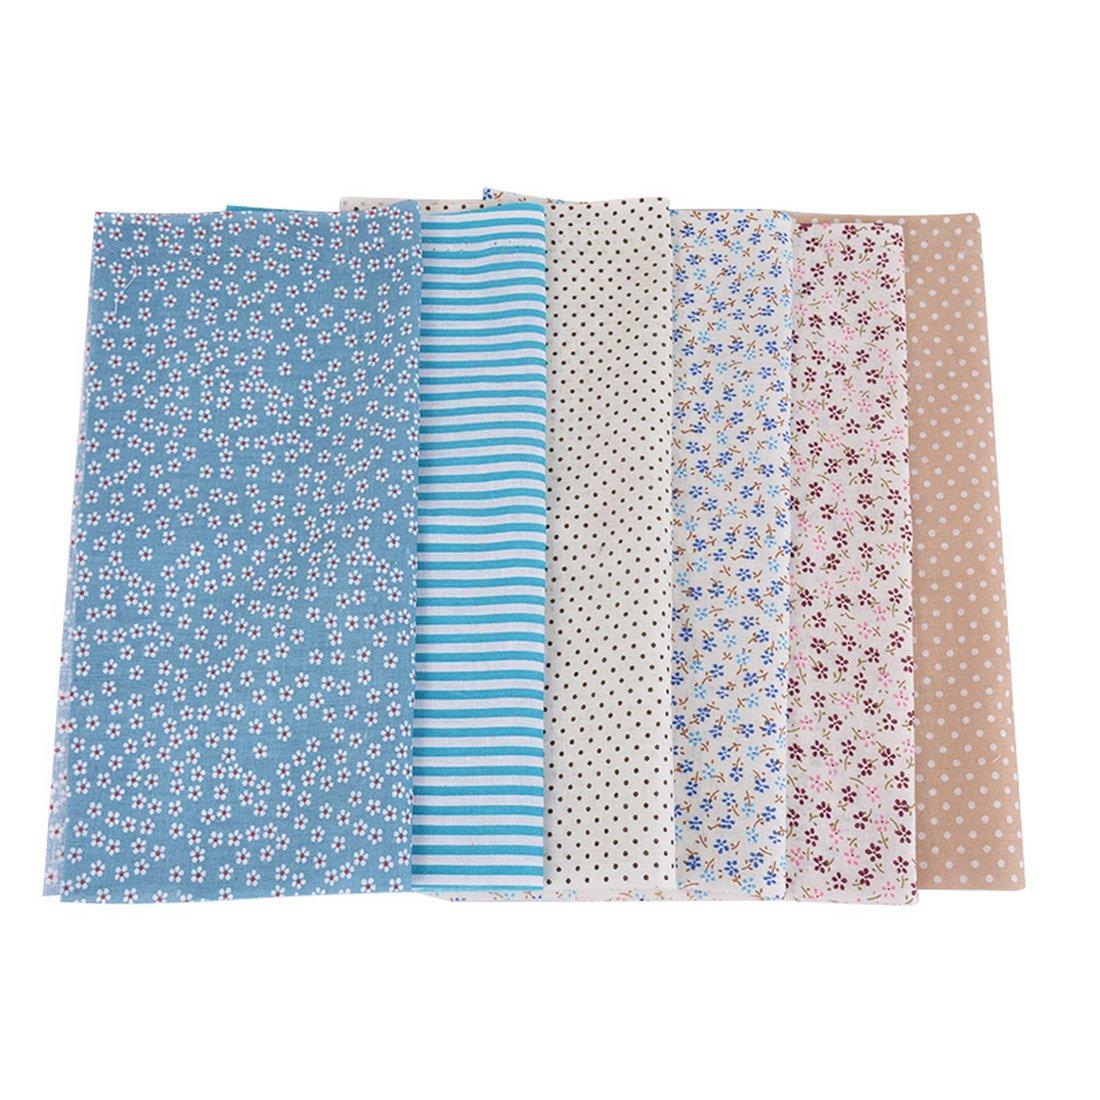 Juego de 6 telas de algodón de Shujin, por metros, para coser, patchwork, de algodón, para manualidades, 25 cm x 25 cm, algodón, azul, 25*25cm: Shujin: Amazon.es: Hogar